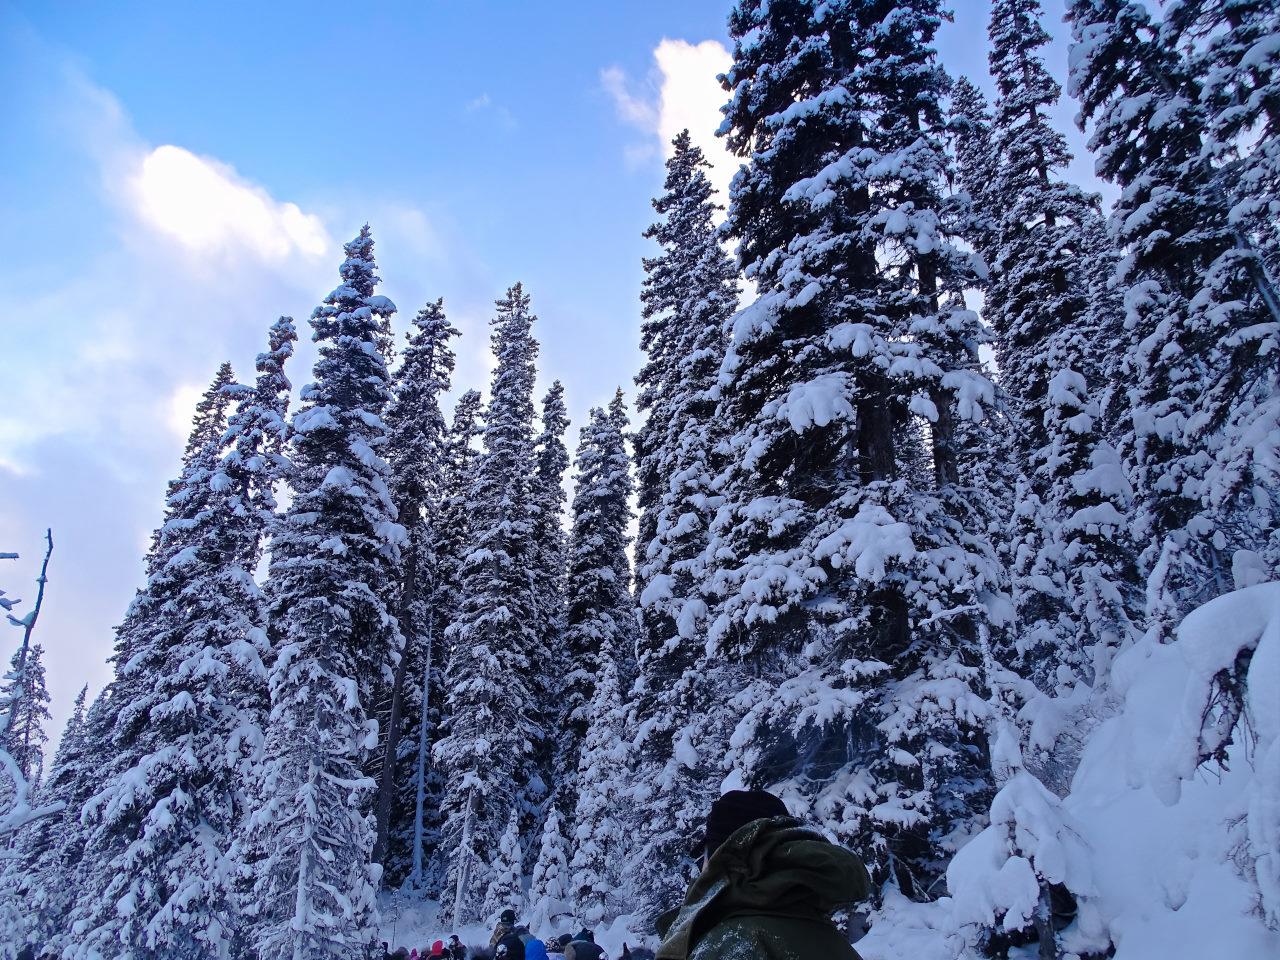 Canada Snow on Trees